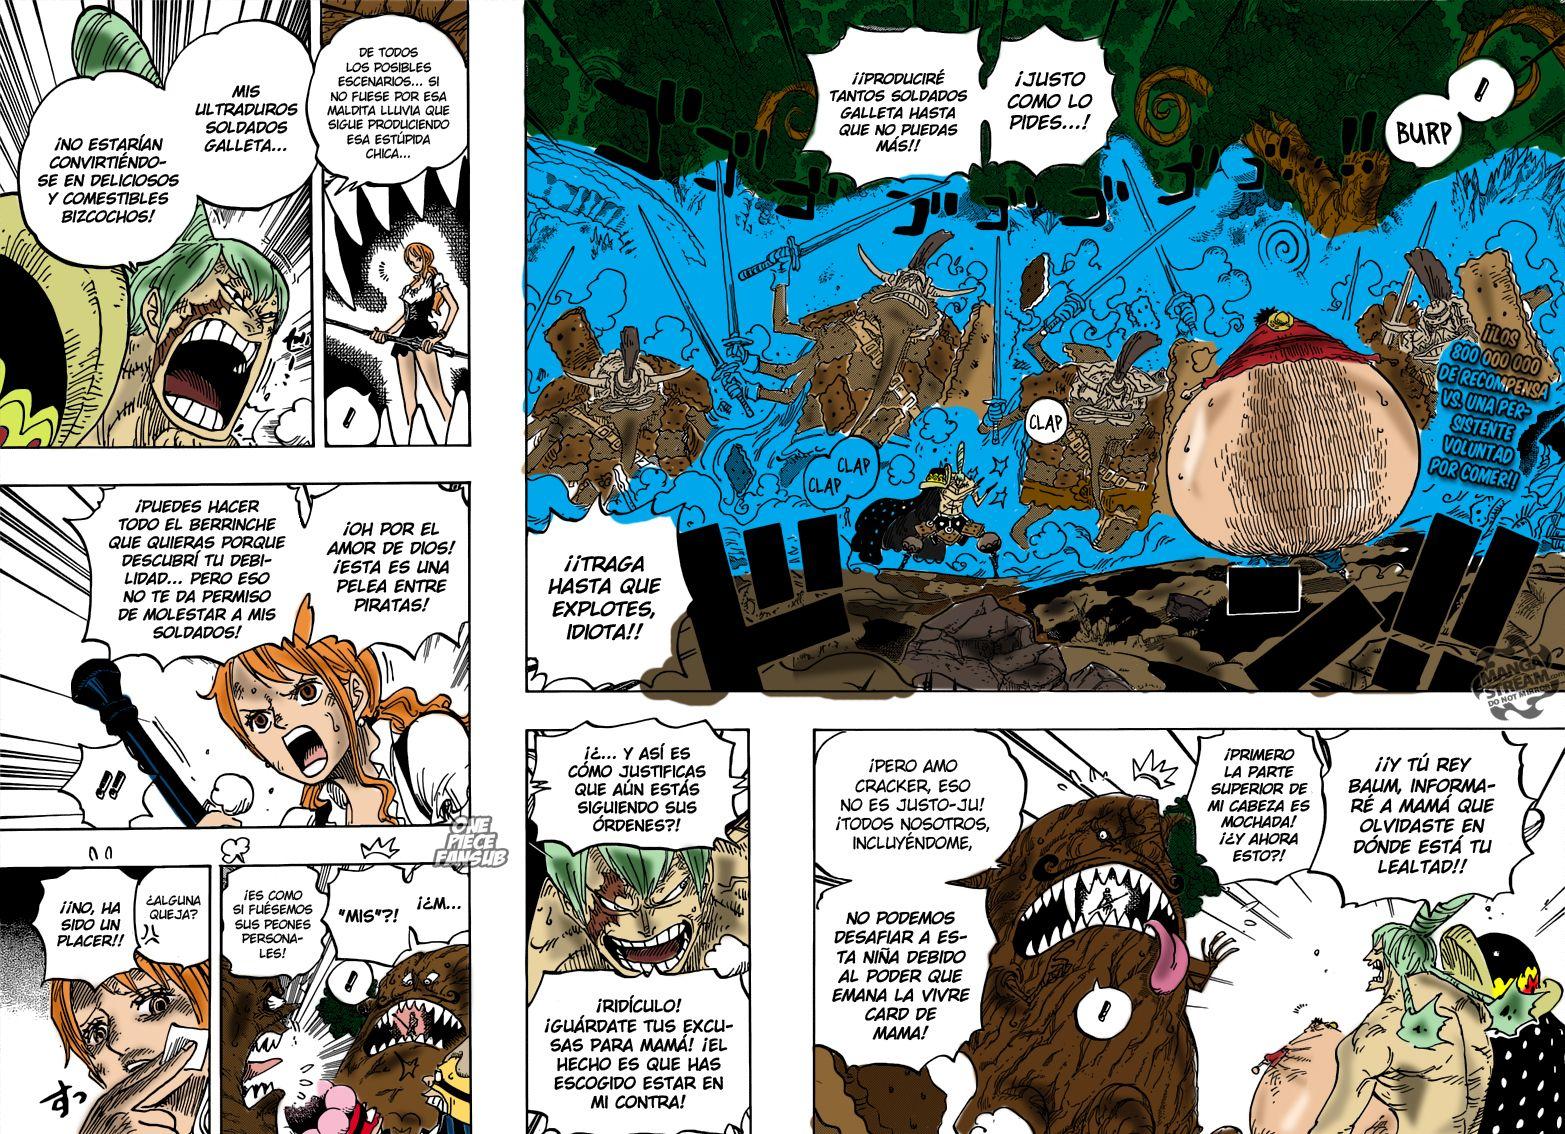 https://c5.ninemanga.com/es_manga/pic2/15/21071/515927/b21ab29d136b3172a2d34952c0938caa.jpg Page 3